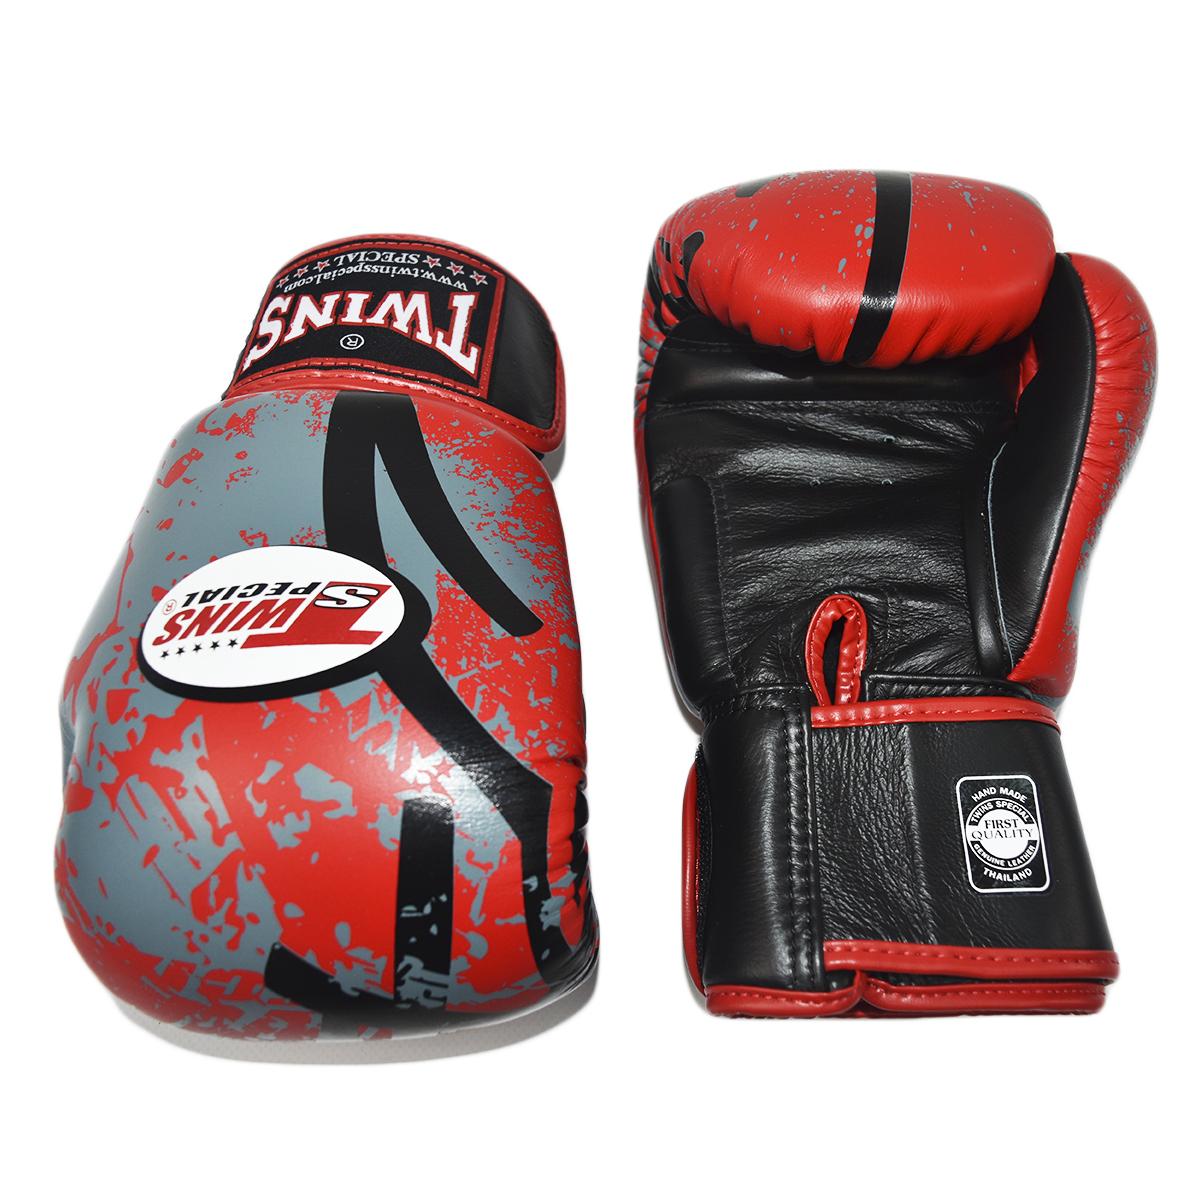 Купить Перчатки для бокса Twins Special FBGV-38 (Red), 3286_rd_bk_gy